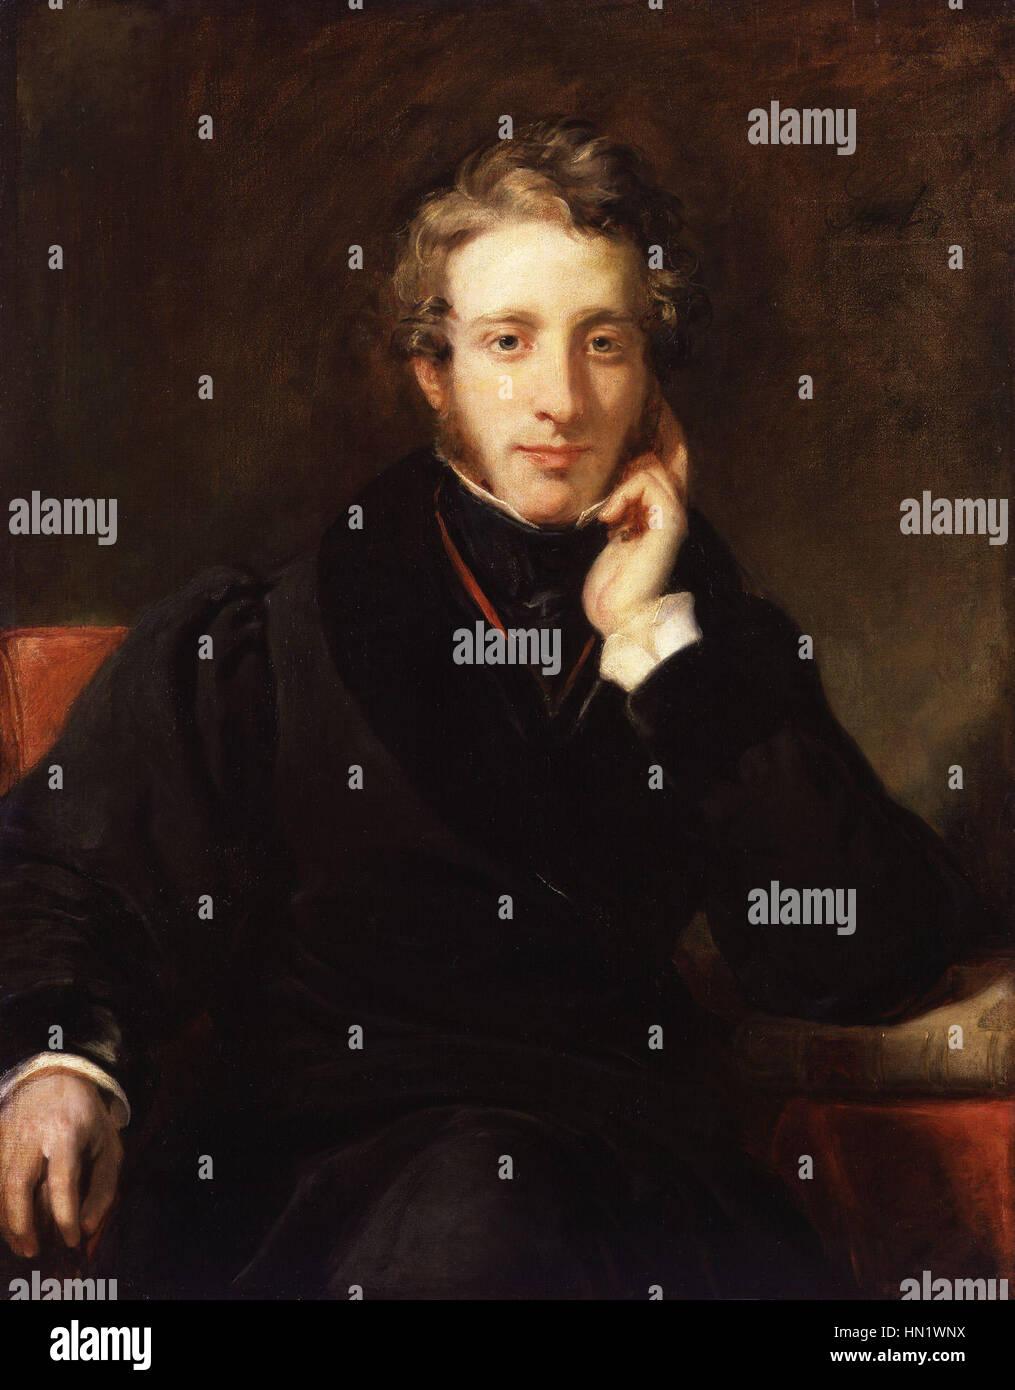 Edward George Earle Lytton Bulwer Lytton, 1st Baron Lytton by Henry William Pickersgill Stock Photo